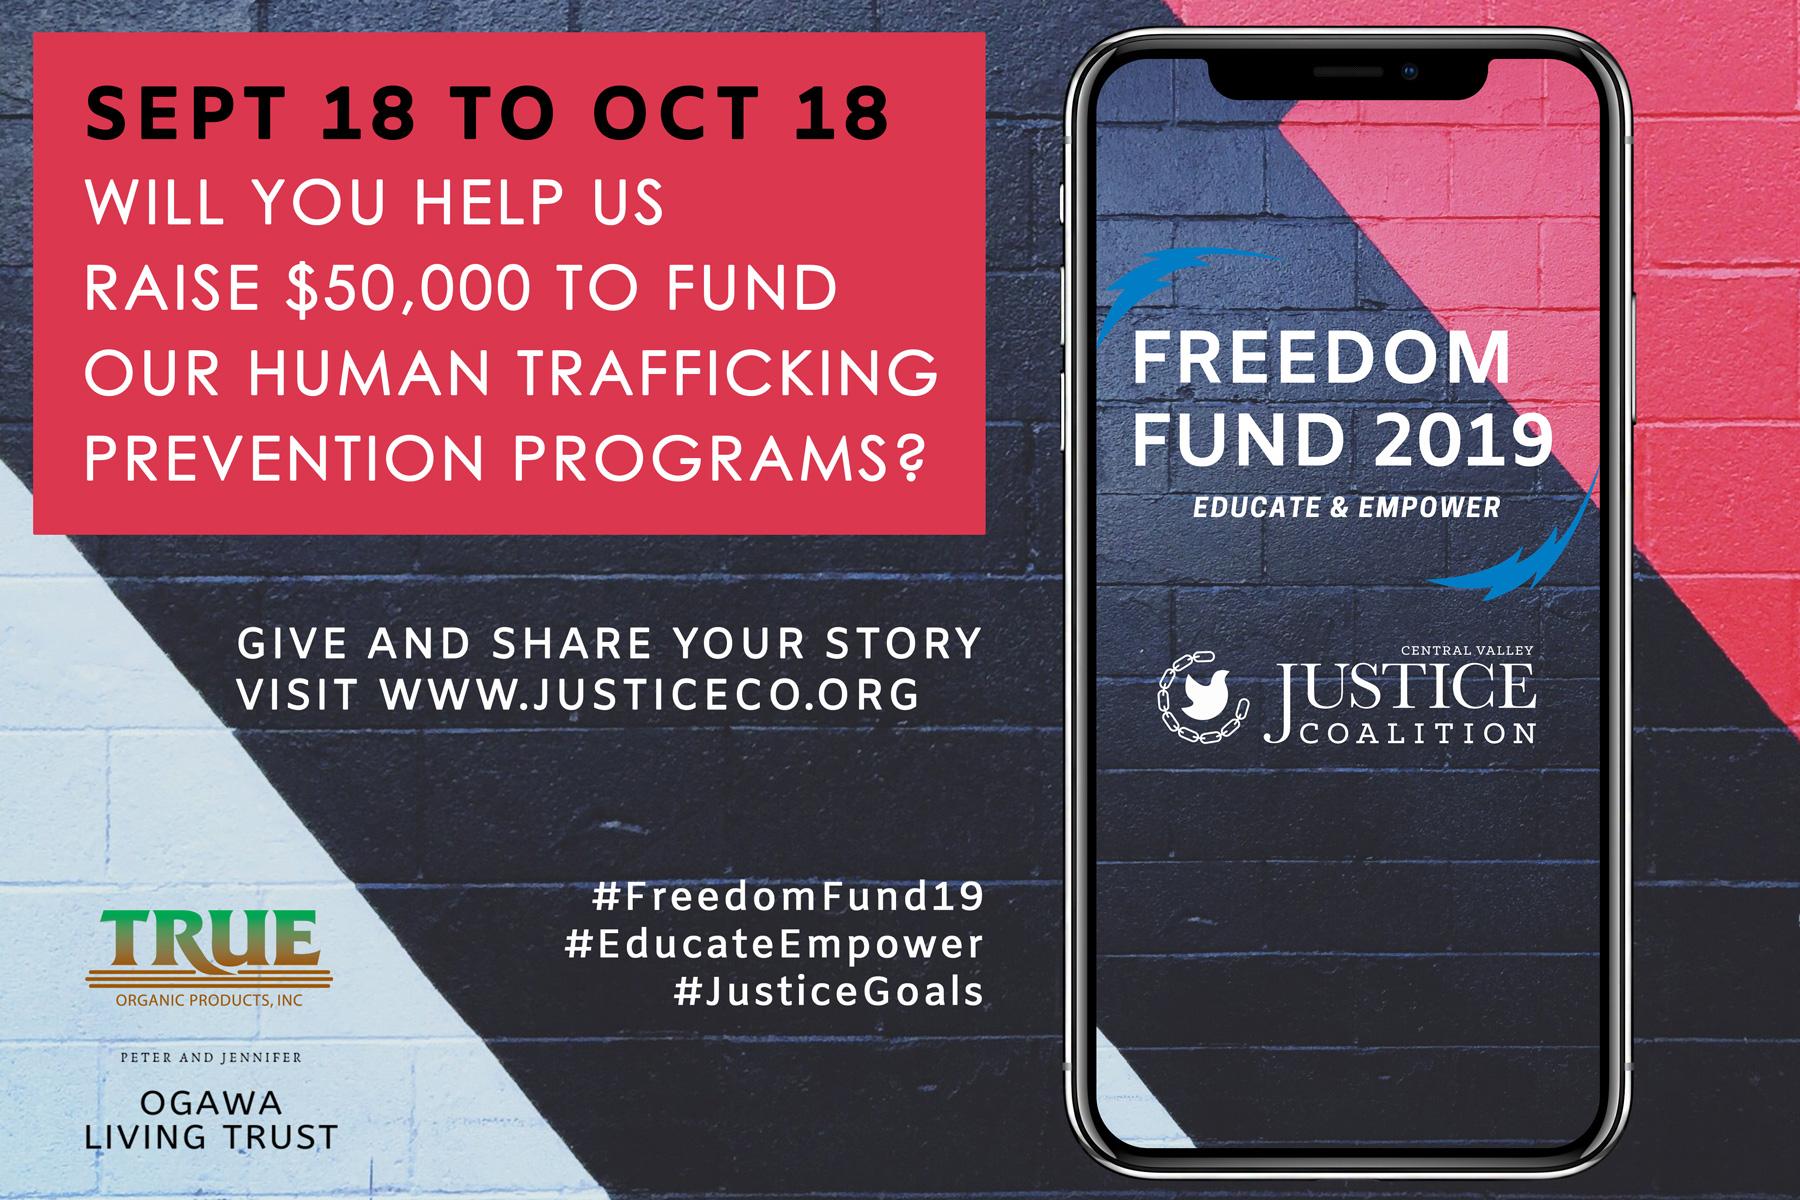 Freedom Fund 2019 promo slide